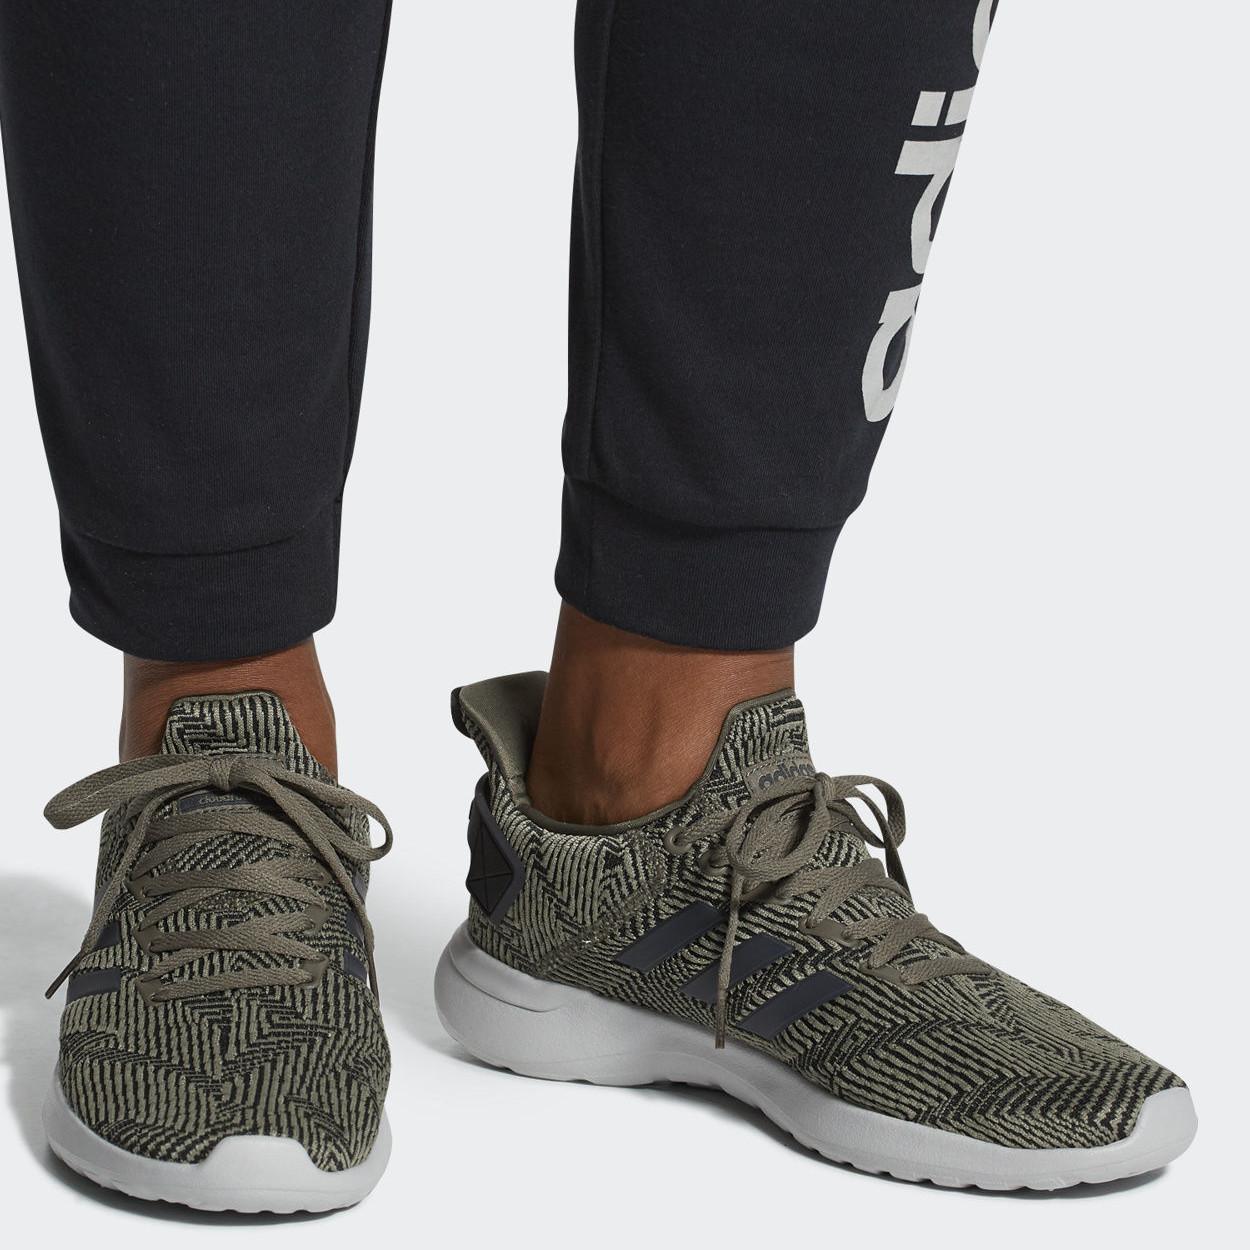 Adidas Scarpe Sneakers Trainers Sportive Ginnastica Tennis CF Lite ... 3797e488637dd